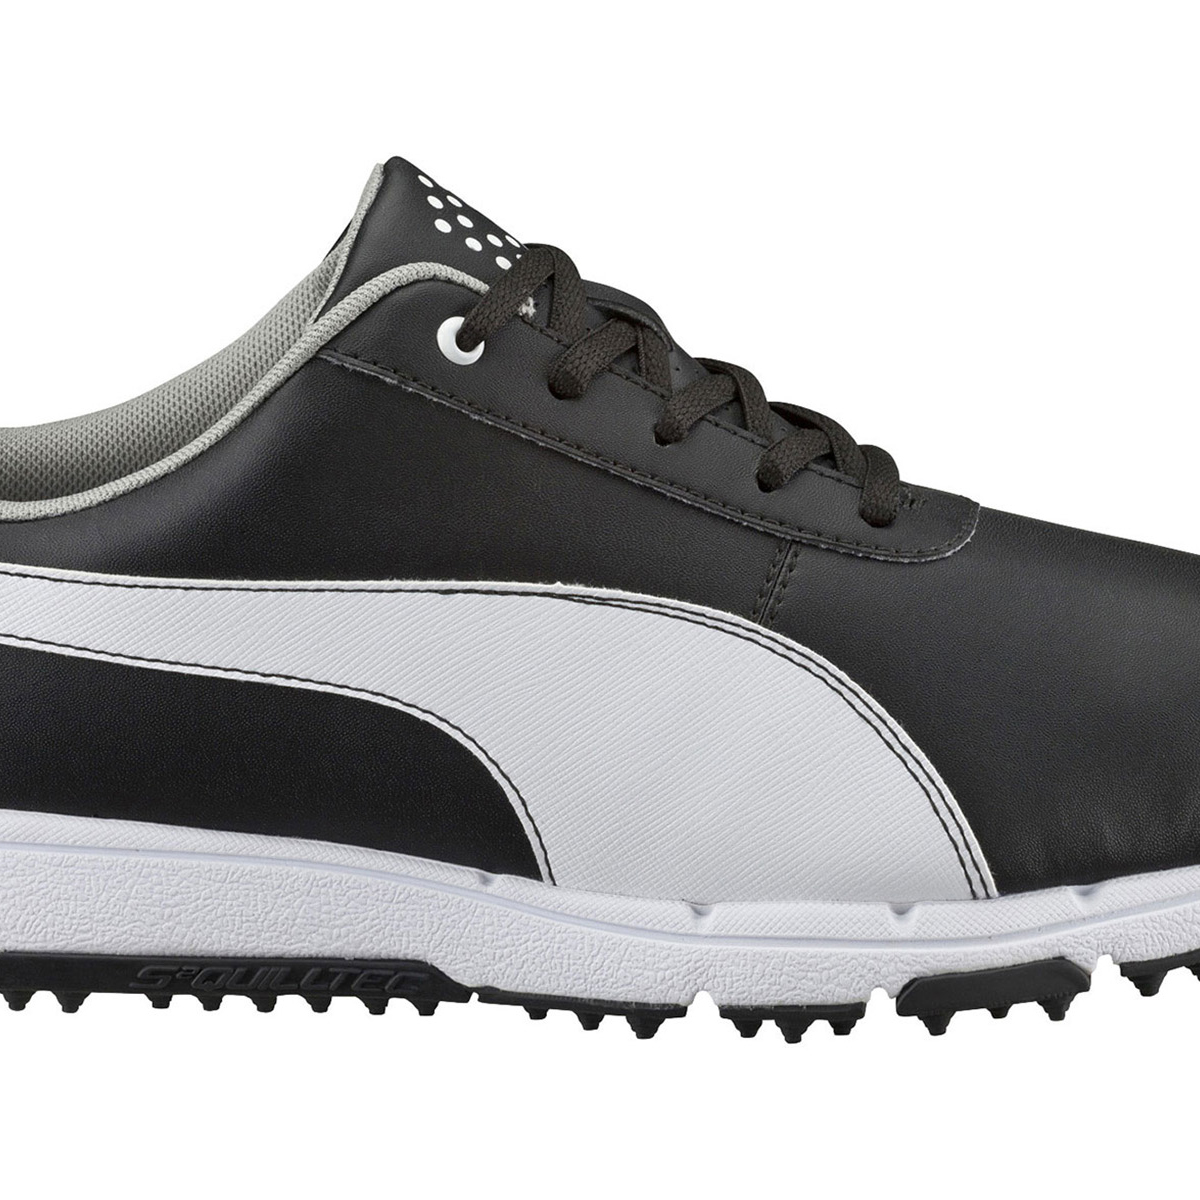 Puma Golf Shoes On Sale Uk